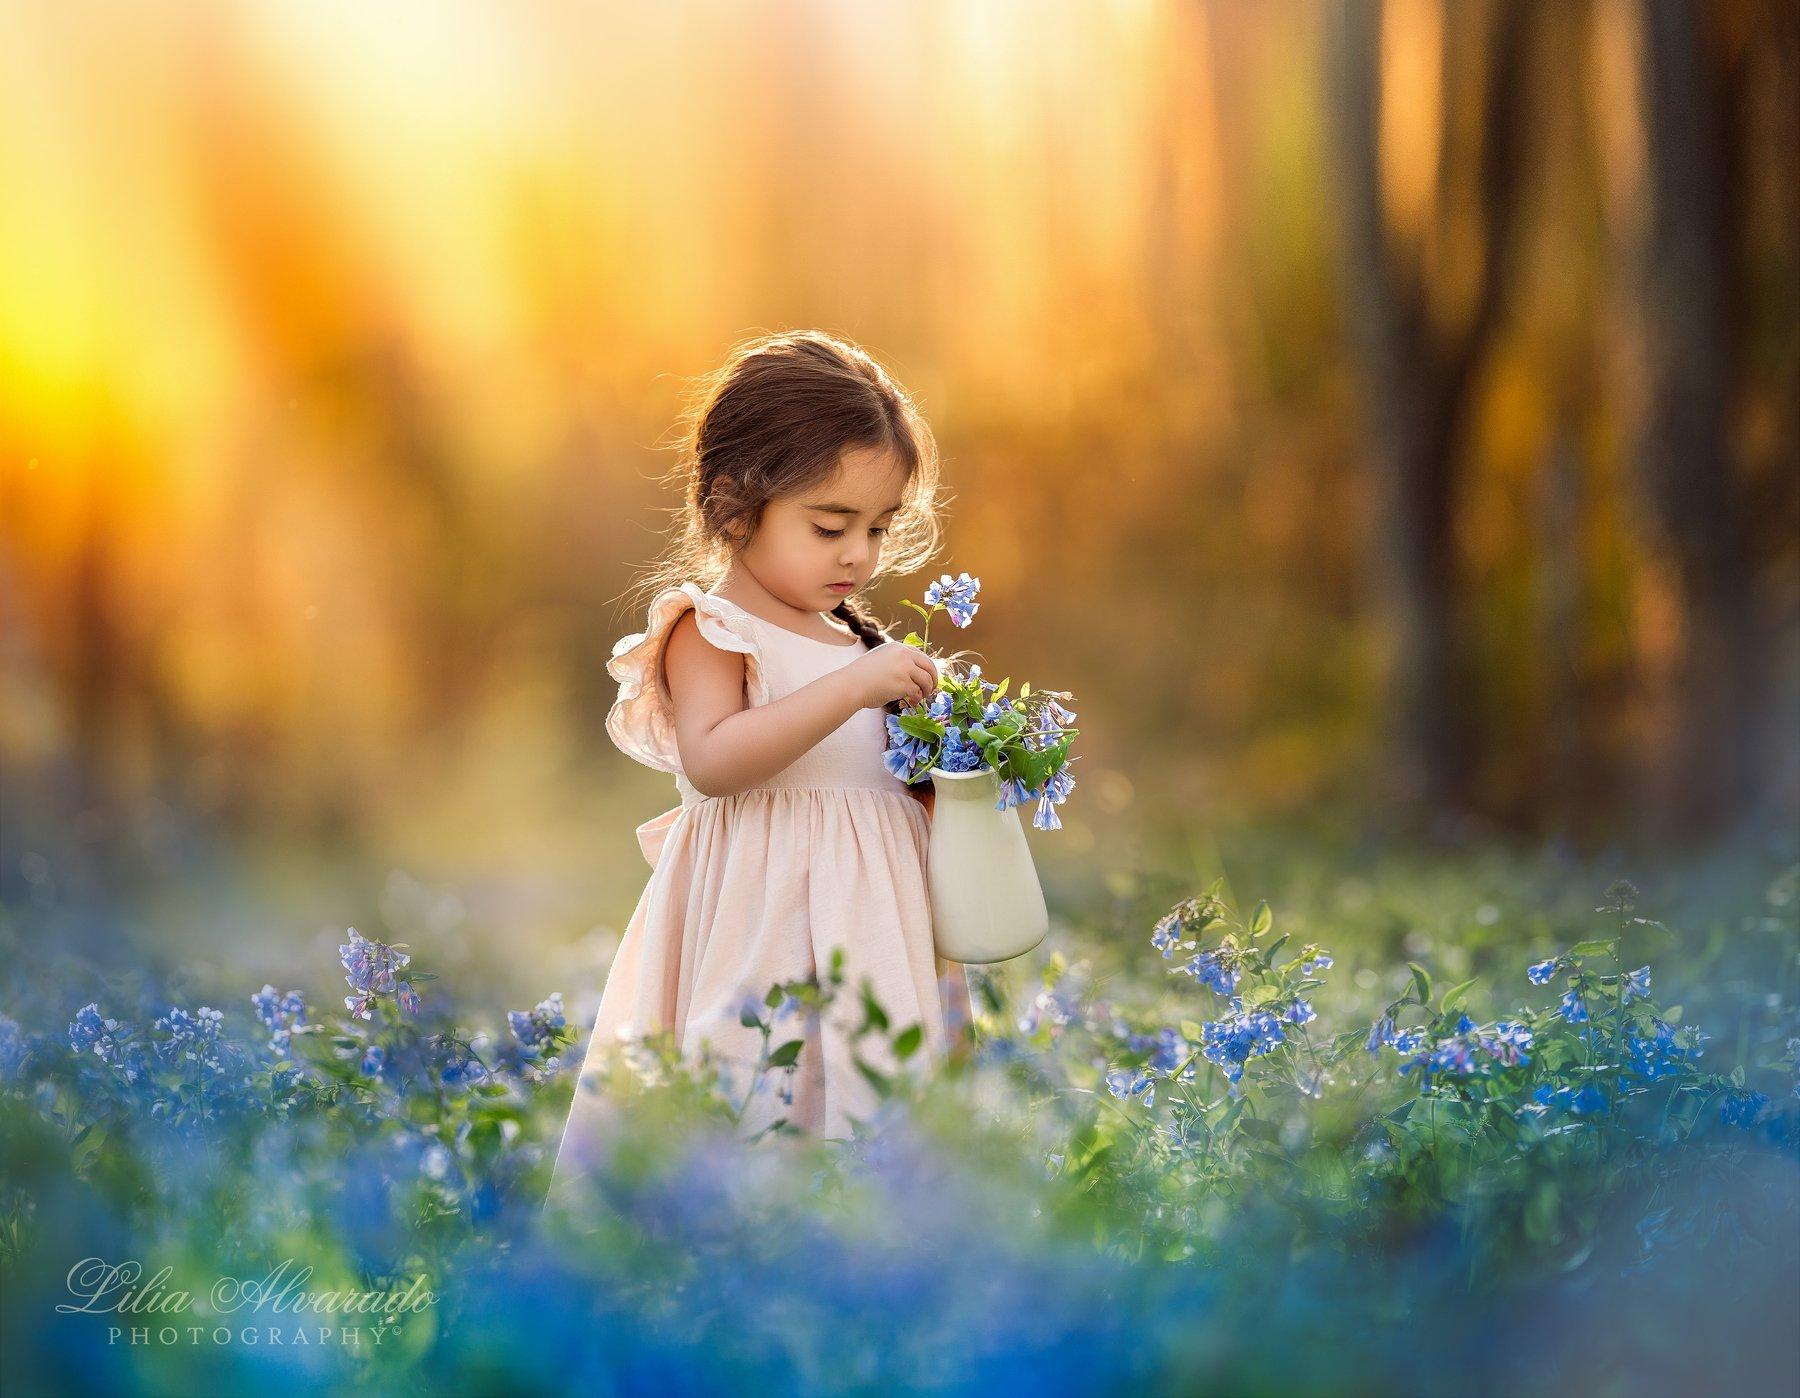 bluebells,spring,field,flowers,candid,child,girl,thoughtful,calm,poetic, brunette, Lilia Alvarado